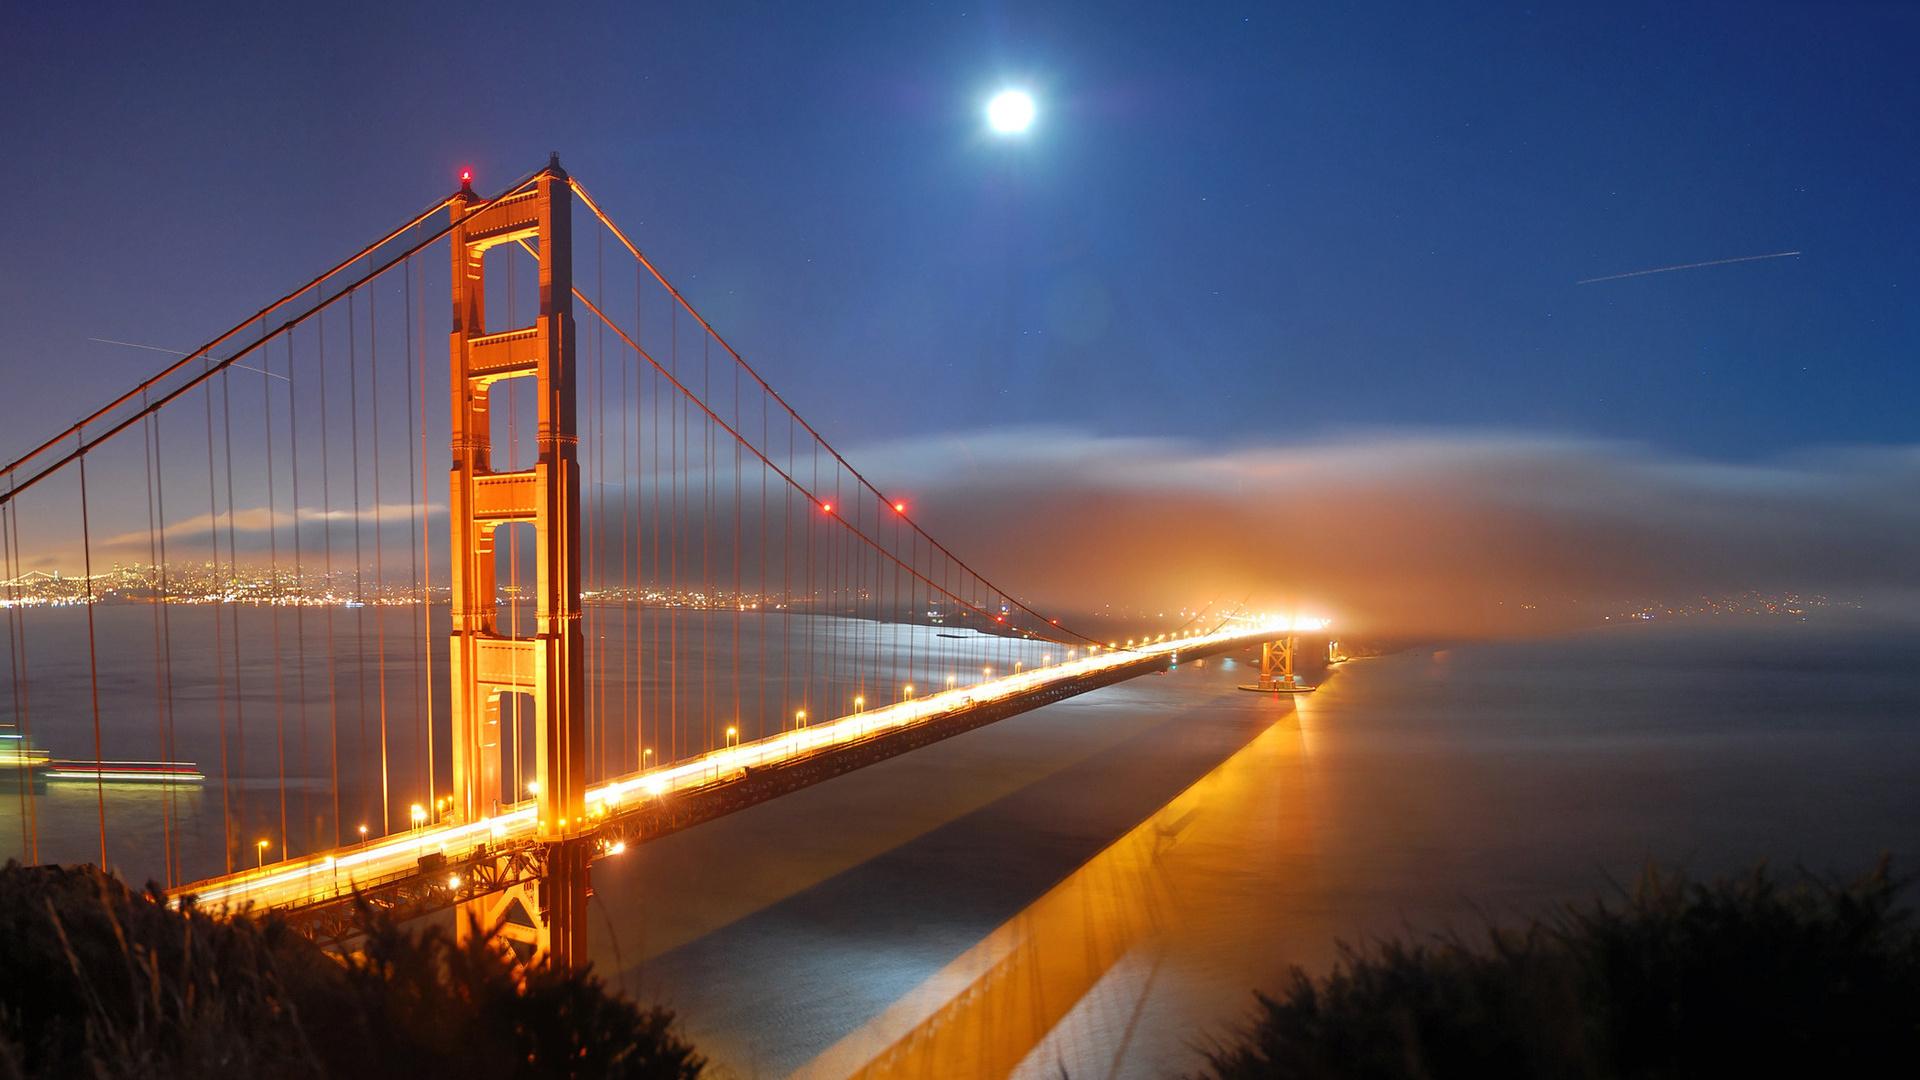 Audi San Francisco >> Bridges Wallpaper HD 1900x1200 - WallpaperSafari